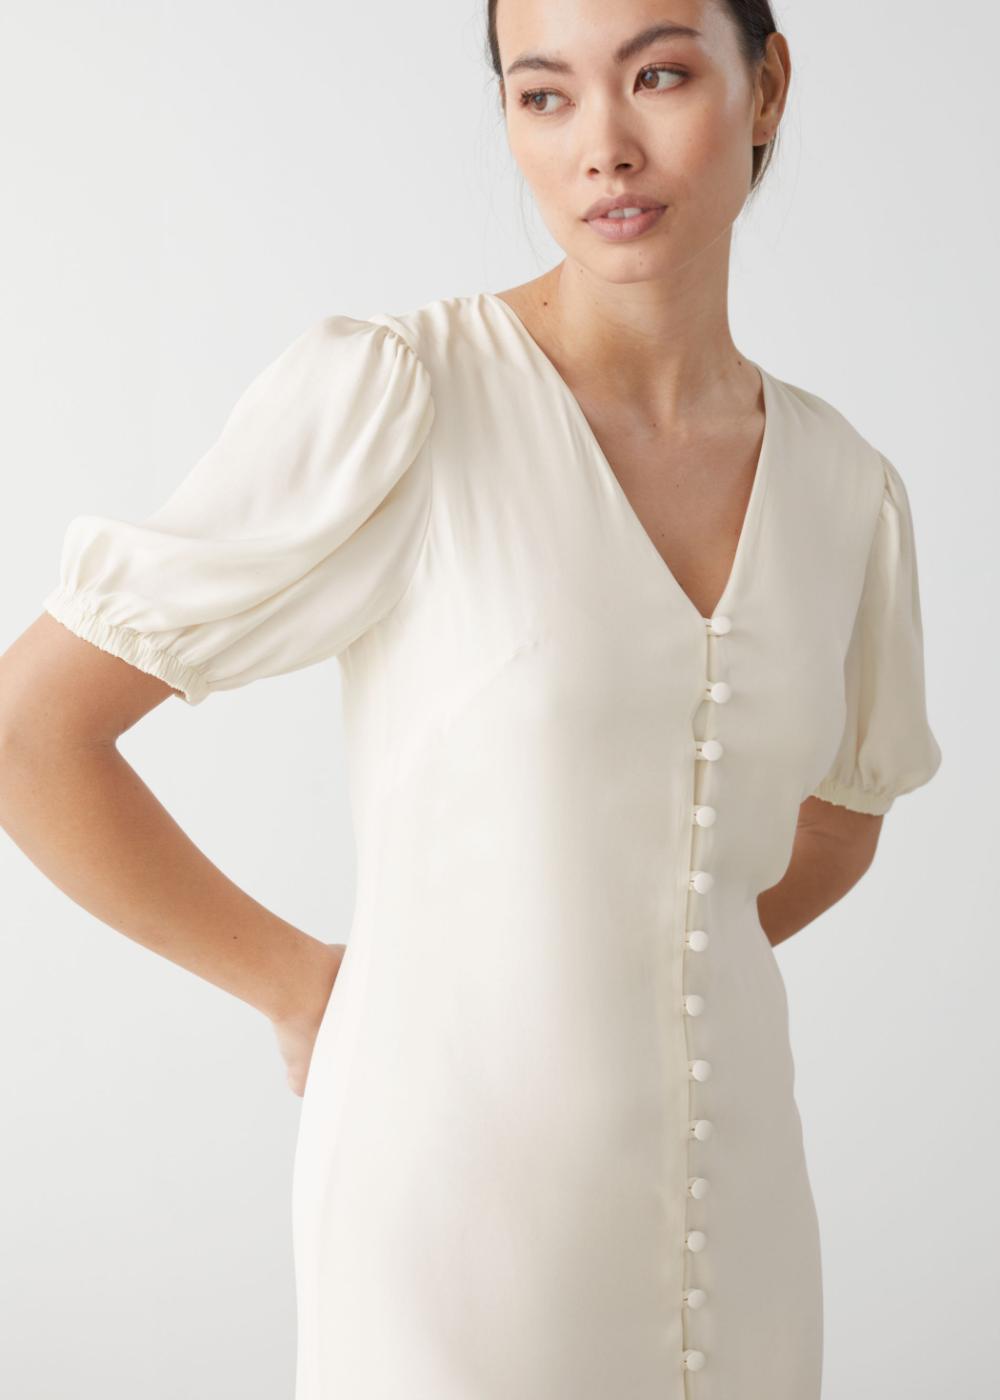 Button Down Puff Sleeve Midi Dress Clothes Midi Dress Puff Sleeve Midi Dresses [ 1400 x 1000 Pixel ]